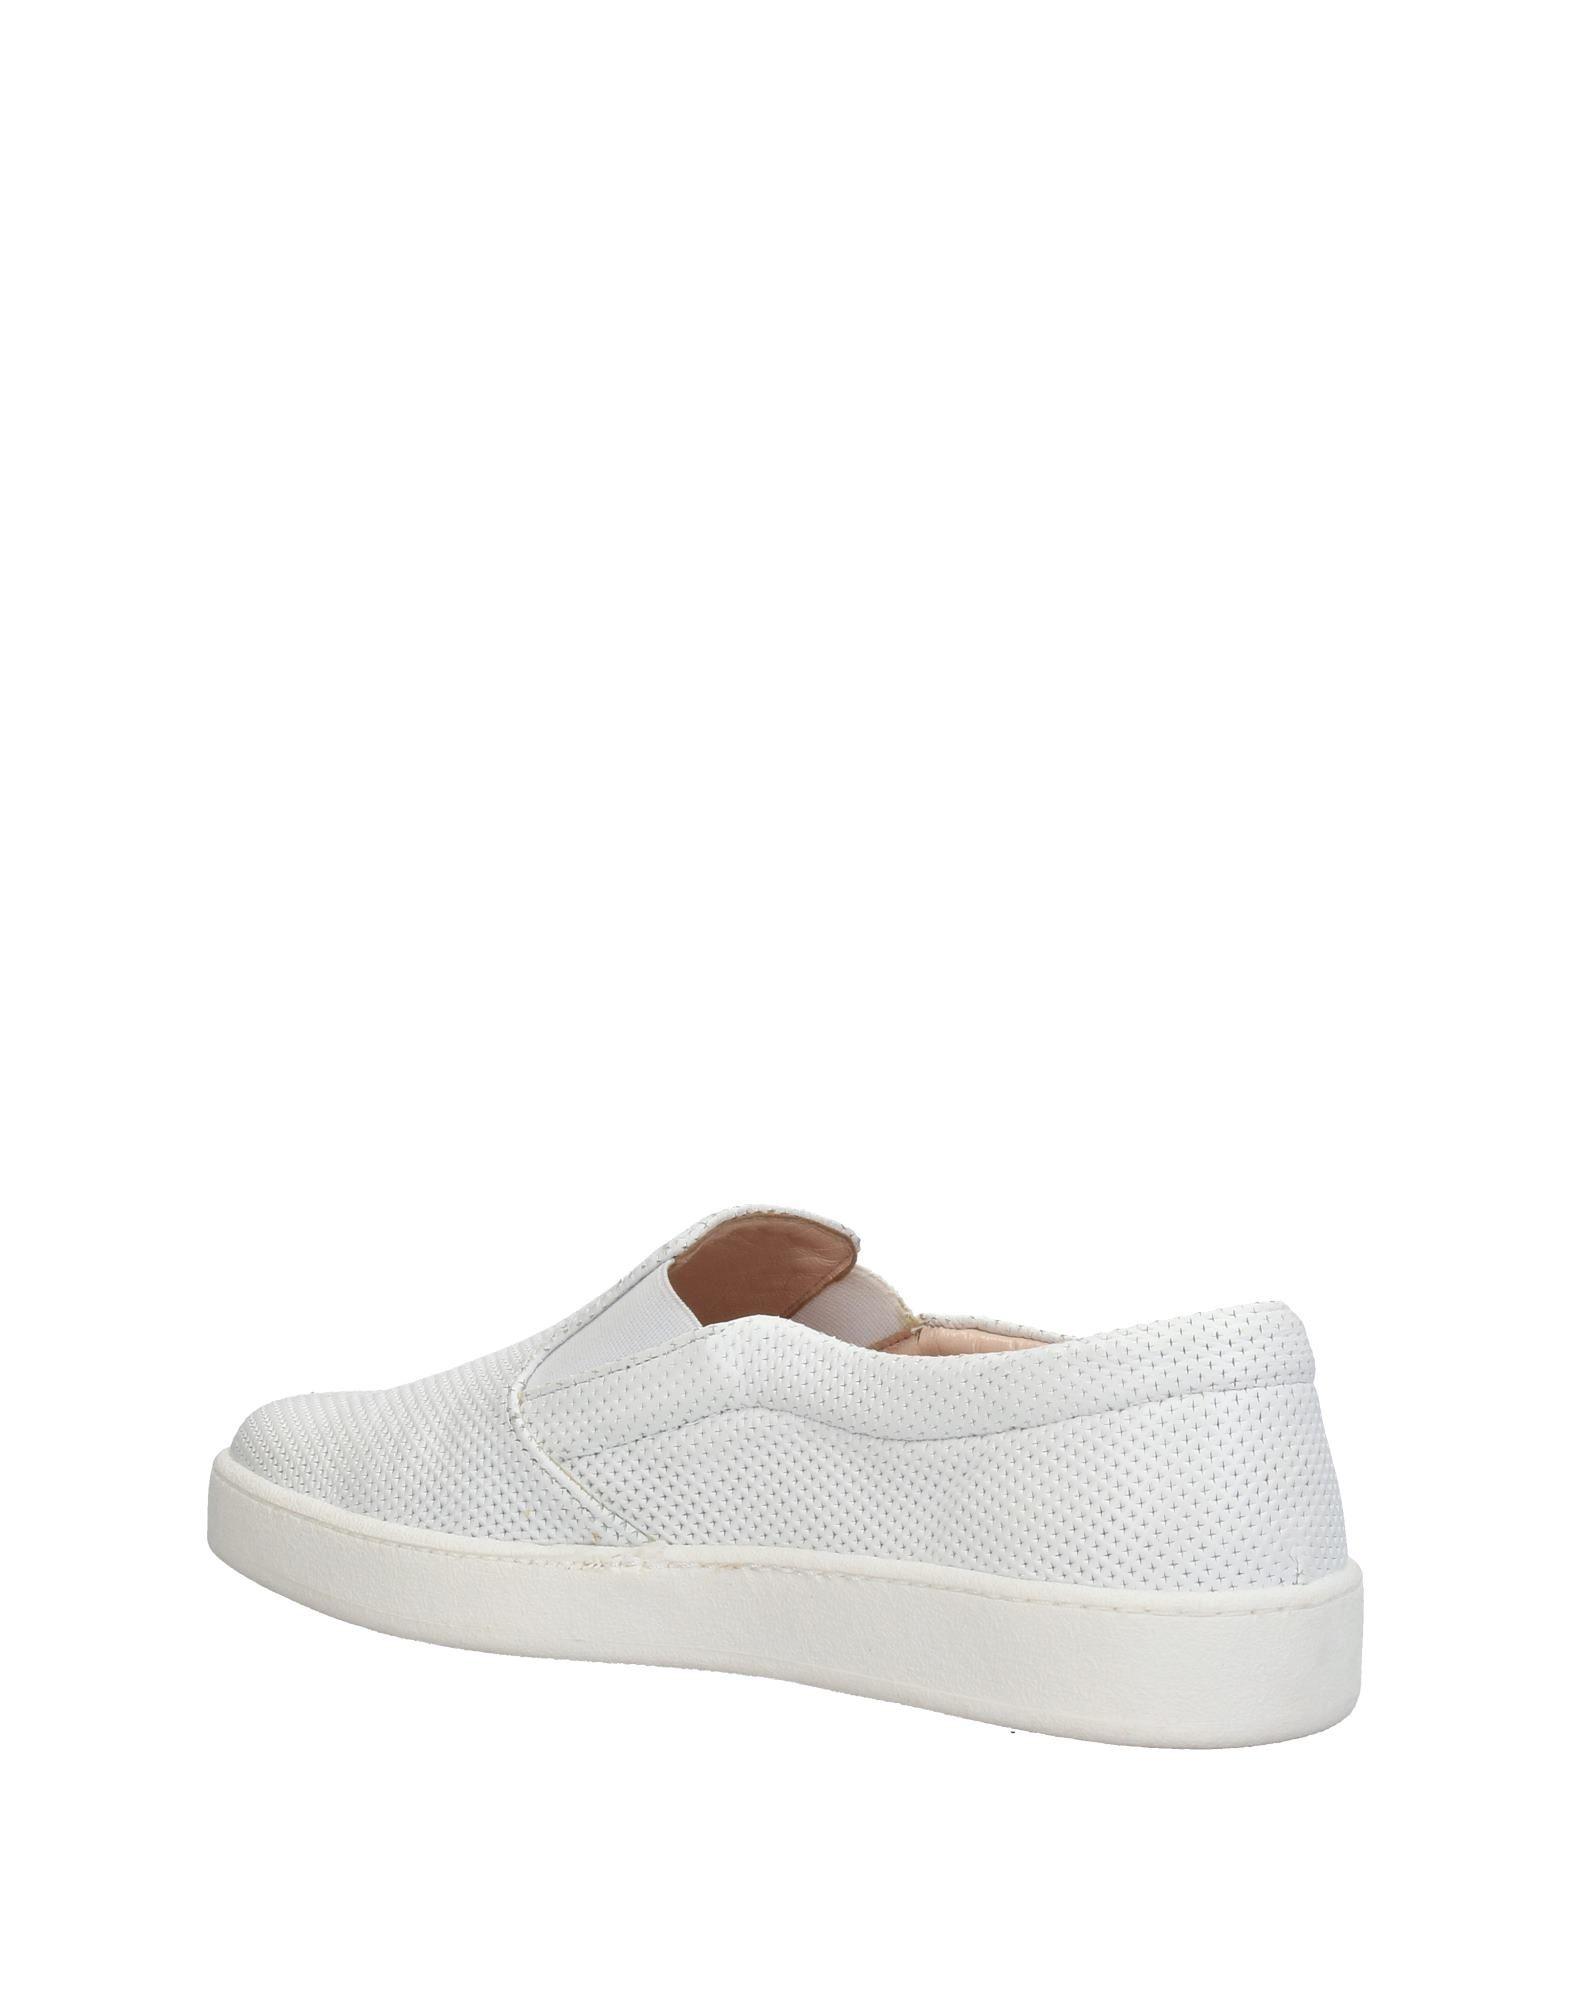 Carlo Pazolini Sneakers Damen   11407955LD   6467c7